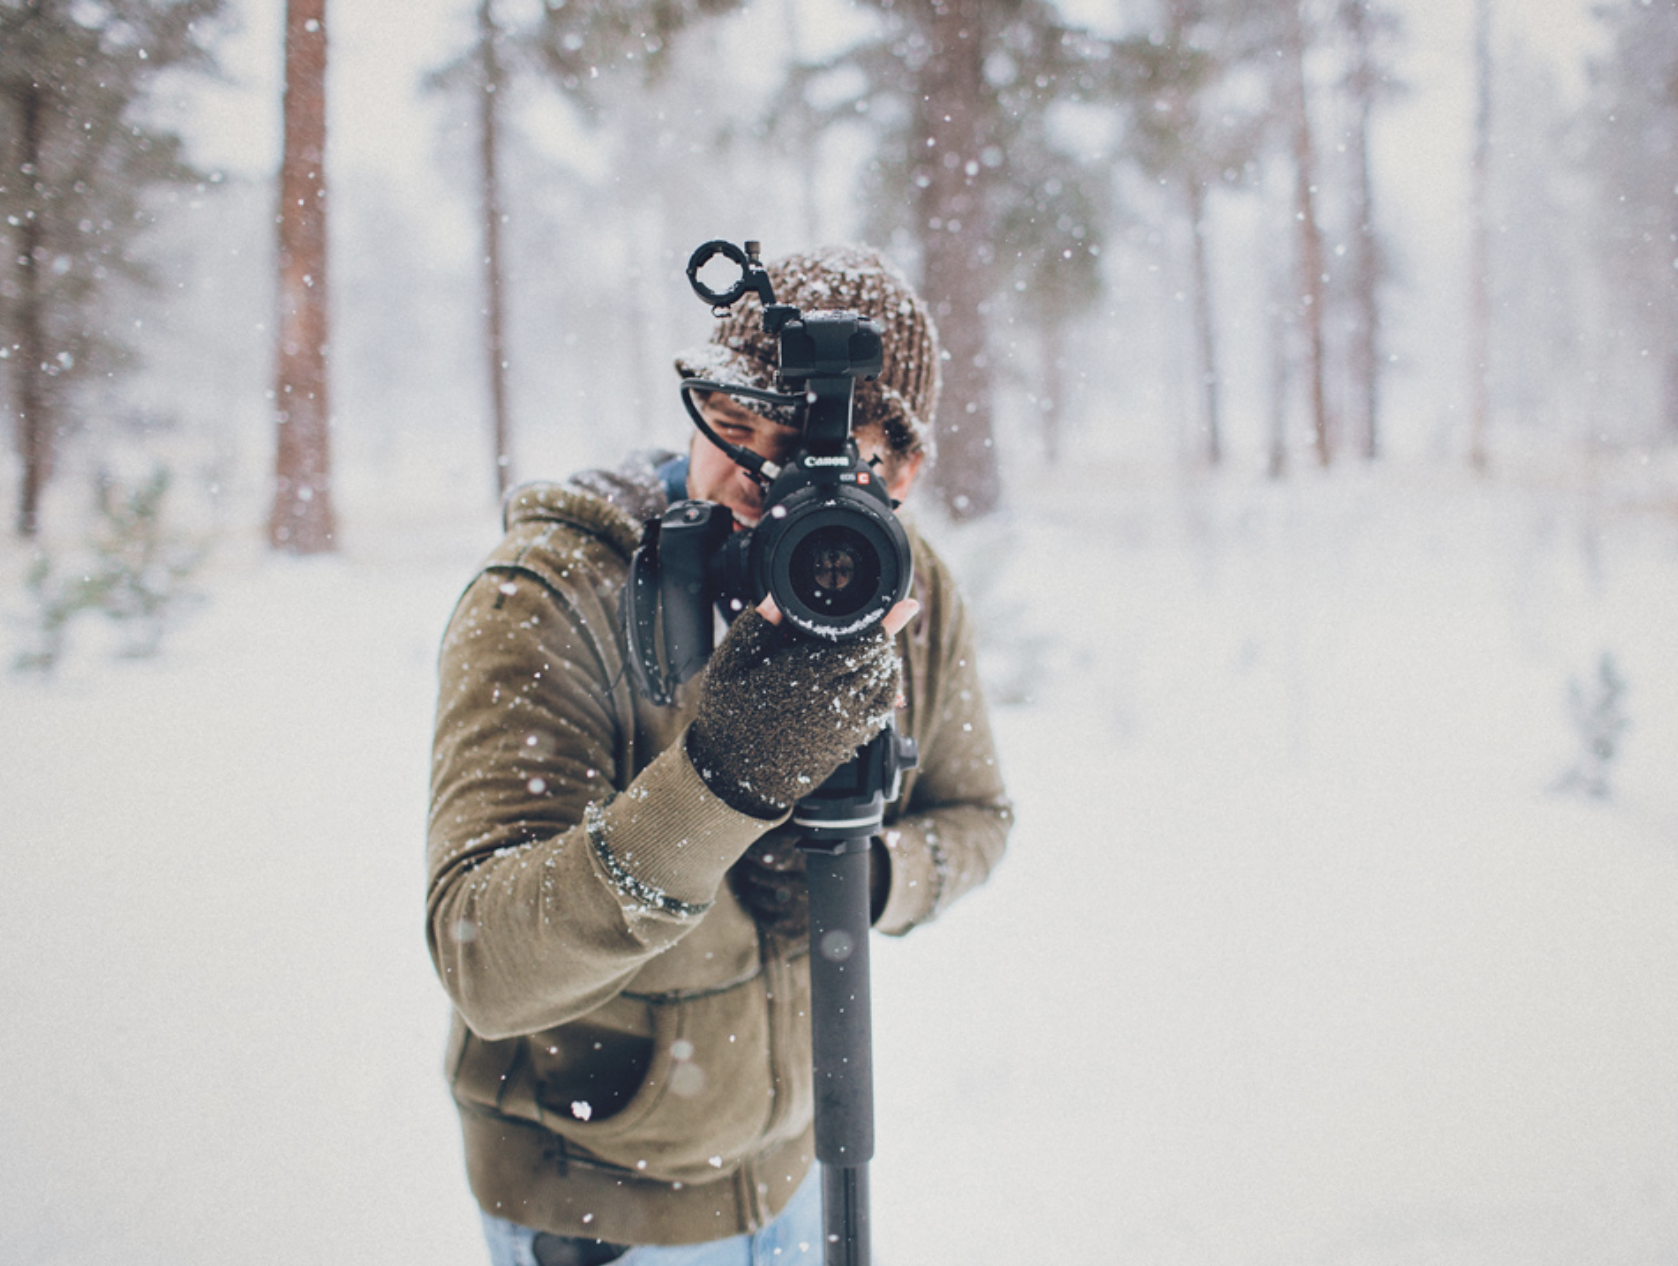 Jay Worsley - Filmmaker, Photographer